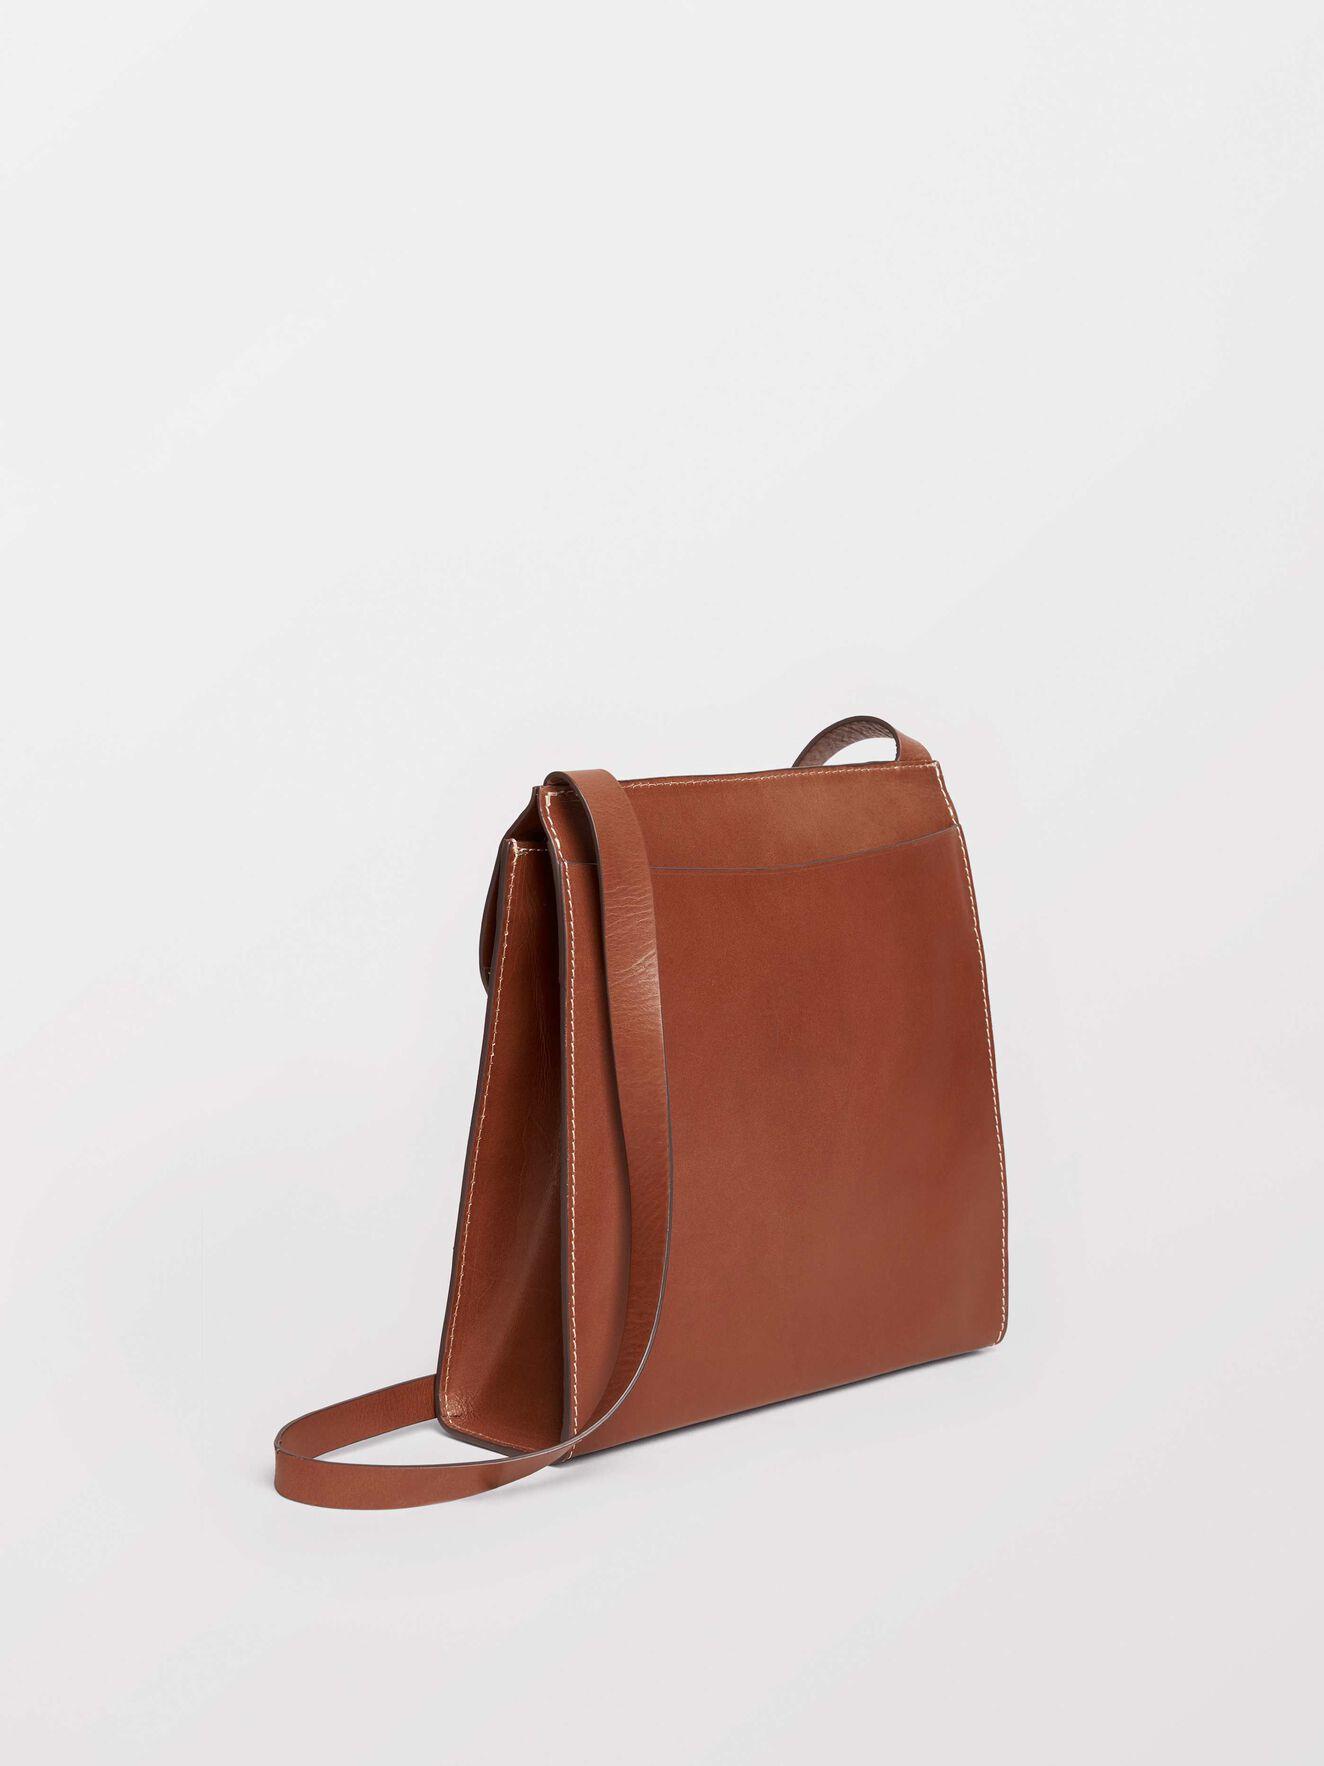 Barron Crossbody Bag in Light Brown from Tiger of Sweden